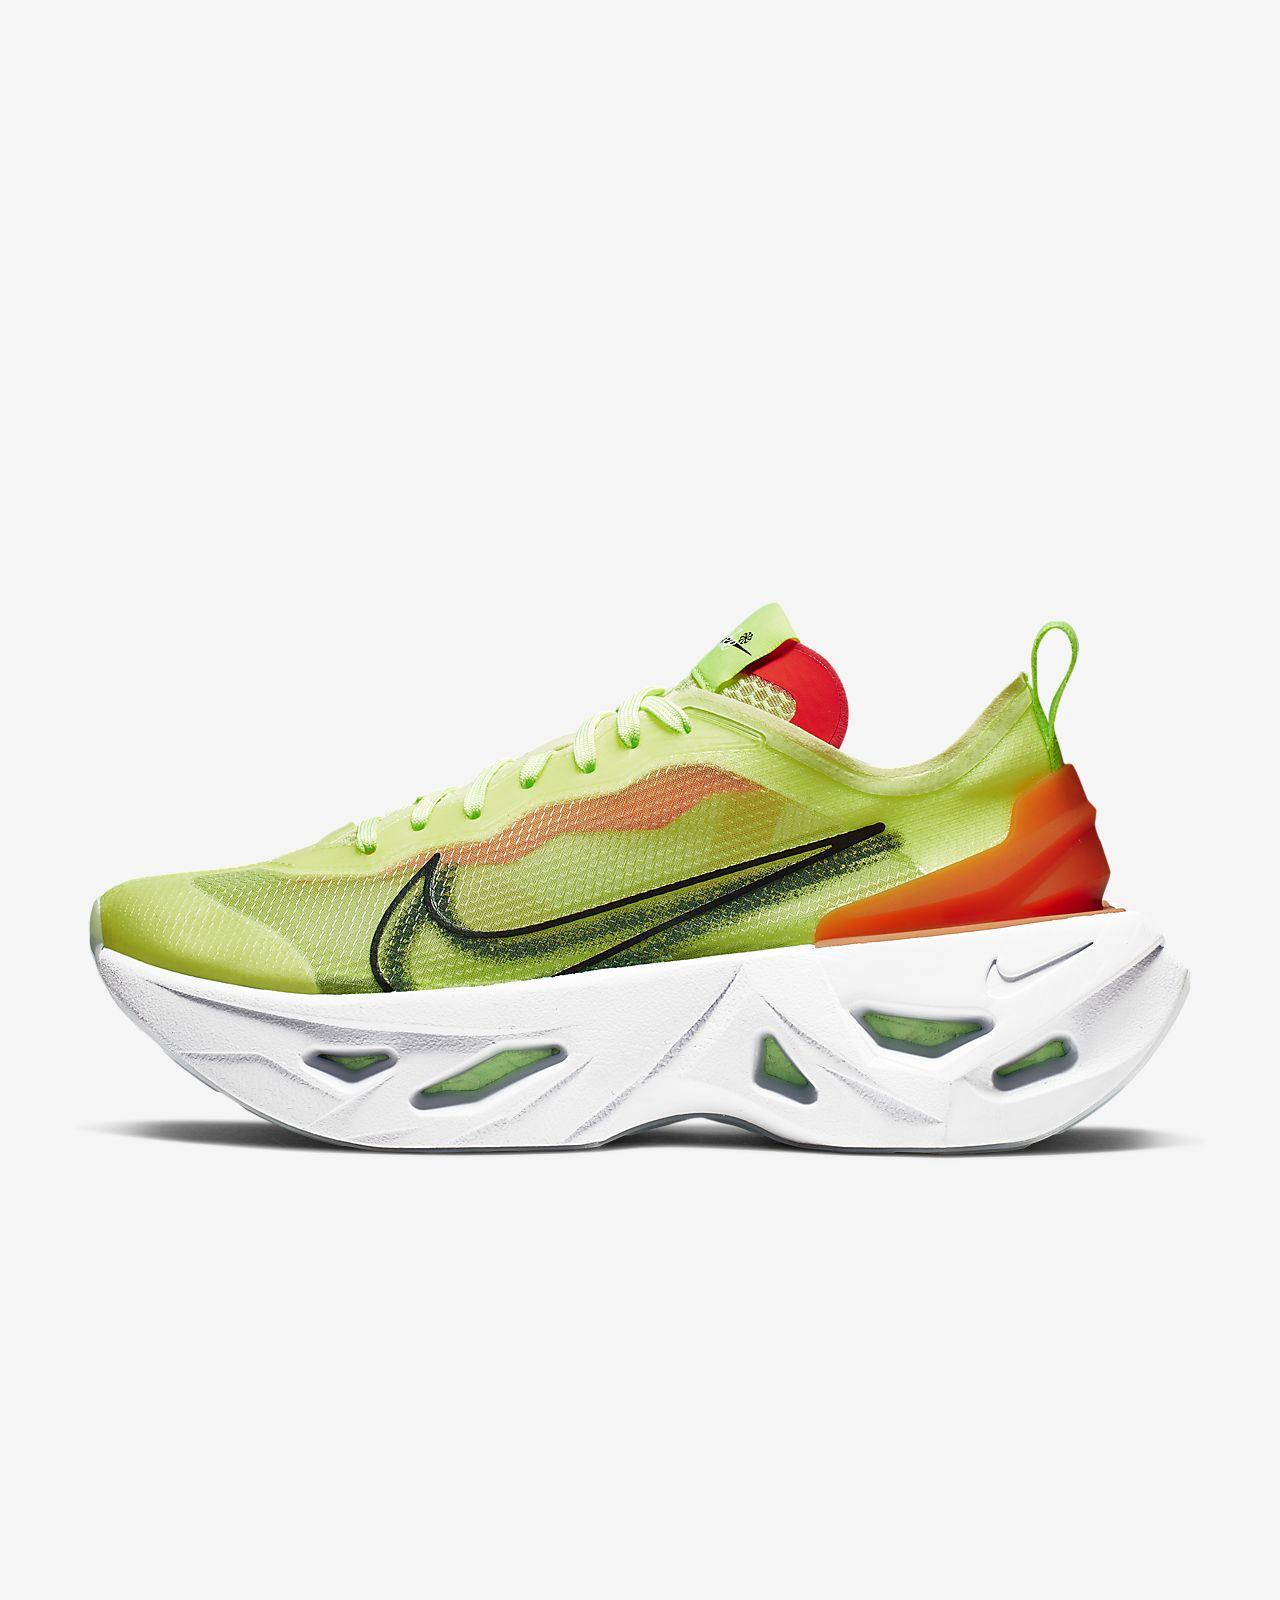 Sapatilhas Nike Zoom X Vista Grind para mulher